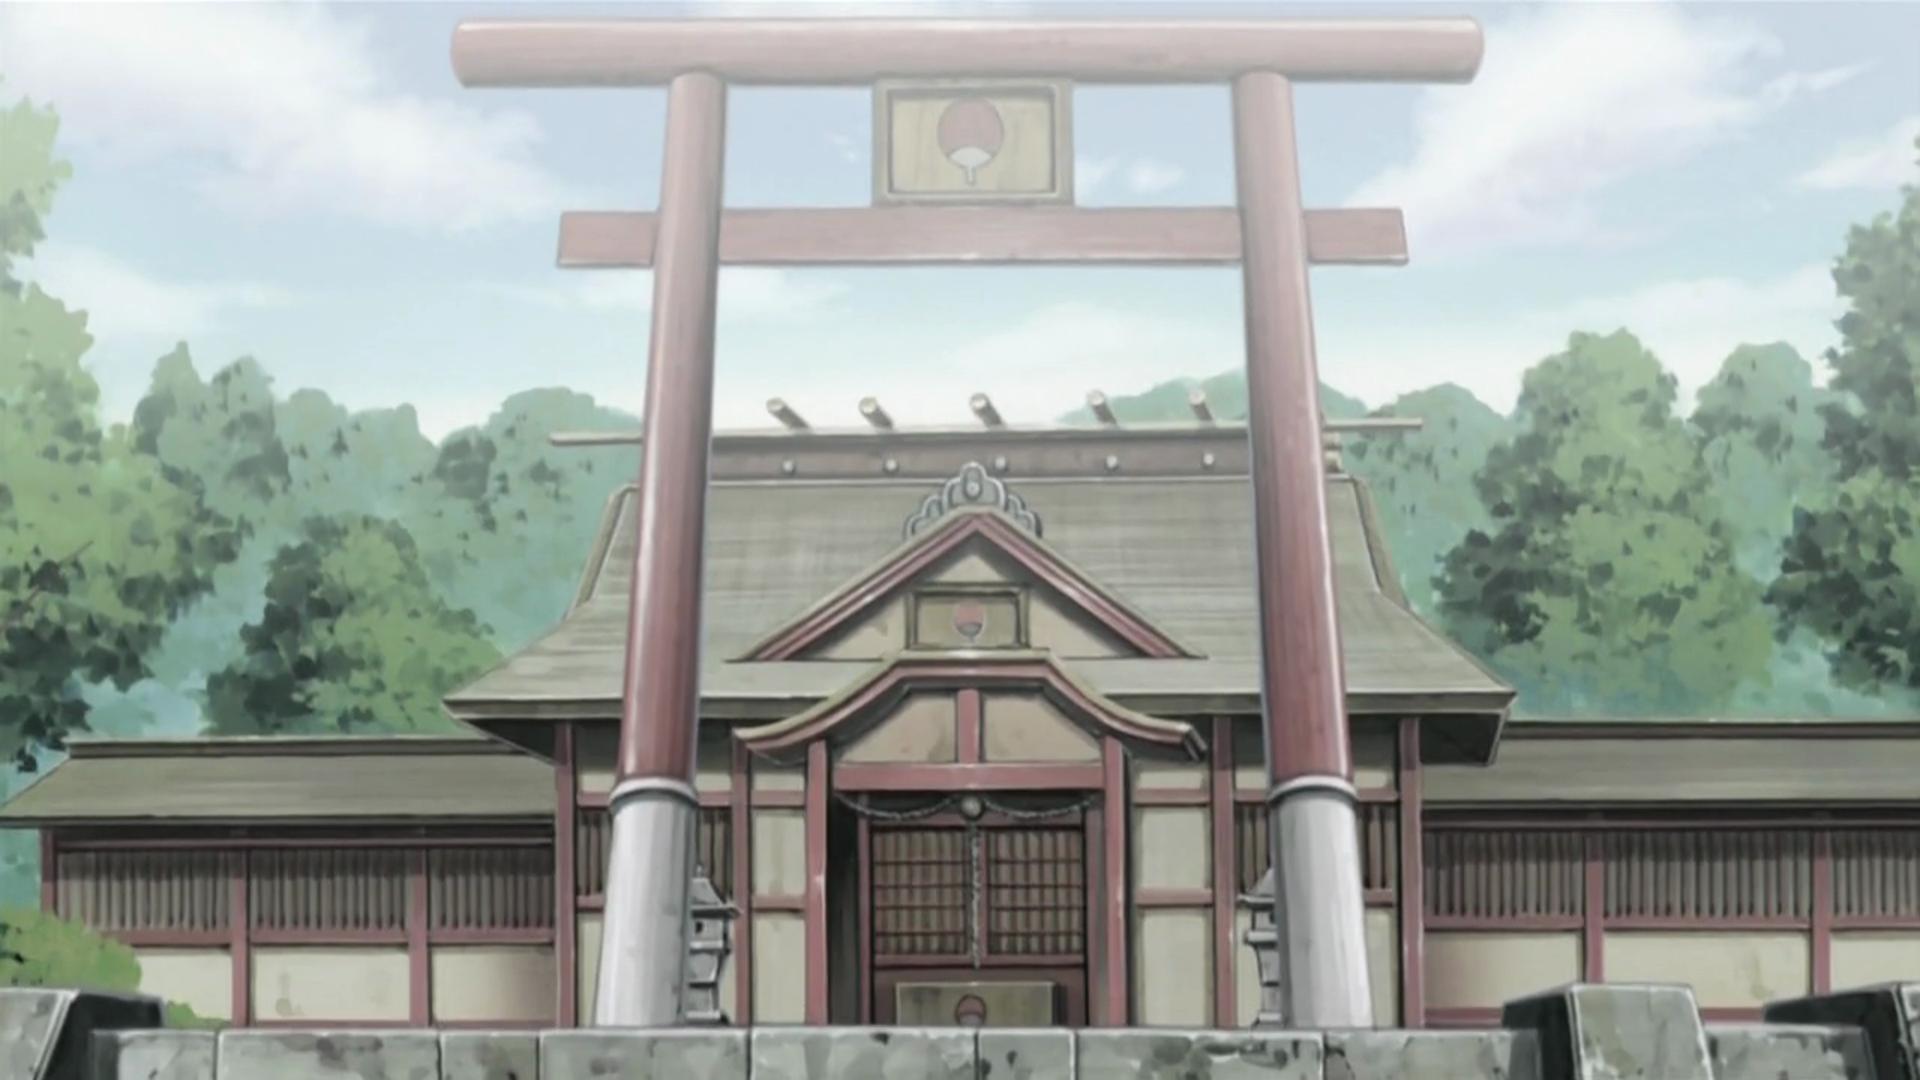 naka shrine narutopedia fandom powered by wikia